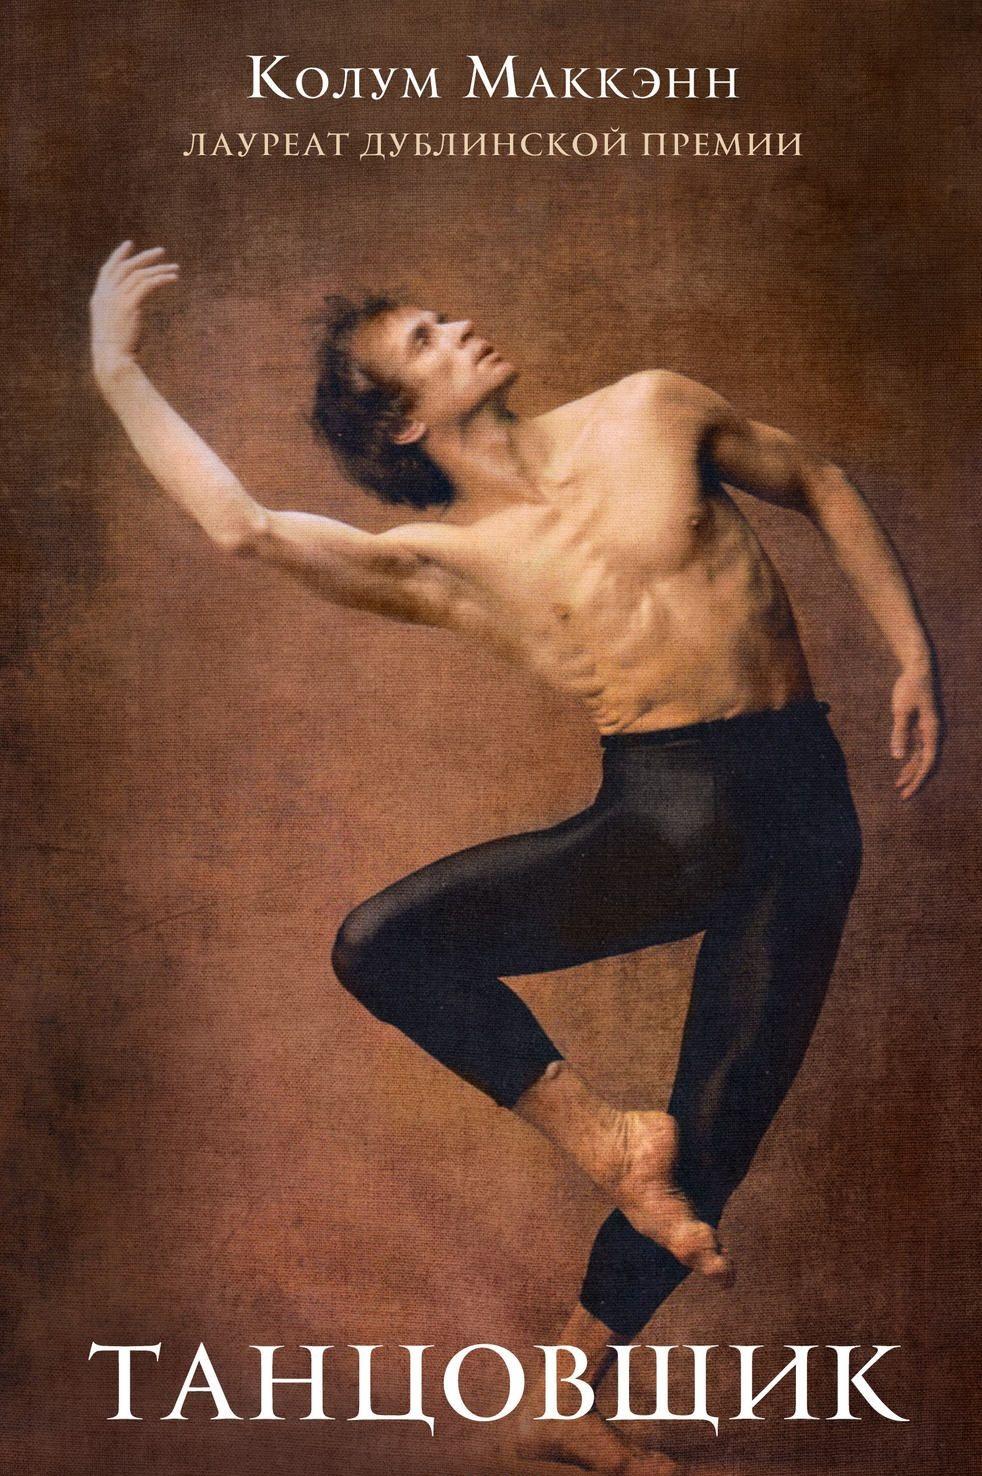 Купить Танцовщик, Колум Маккэнн, 978-5-86471-665-6, 978-5-86471-665-8